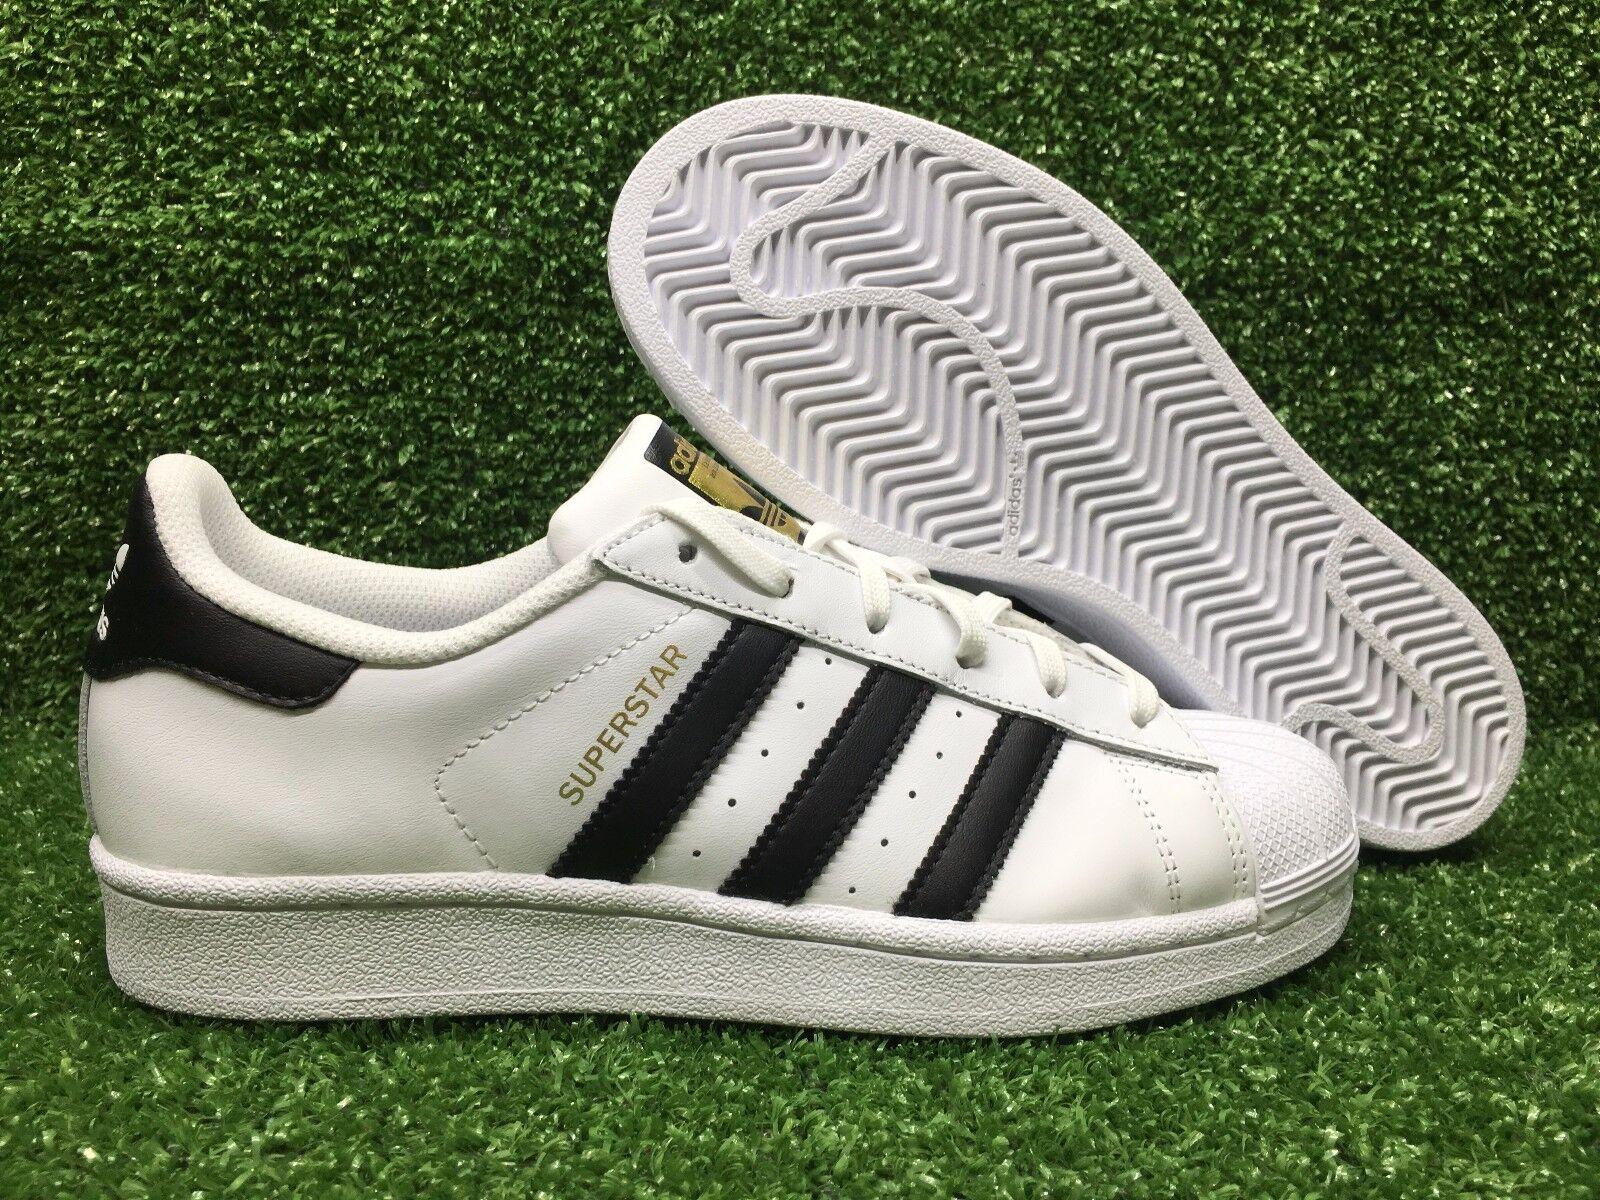 New Adidas Original C77124 Superstar White Black Gold Label Foundation Men's